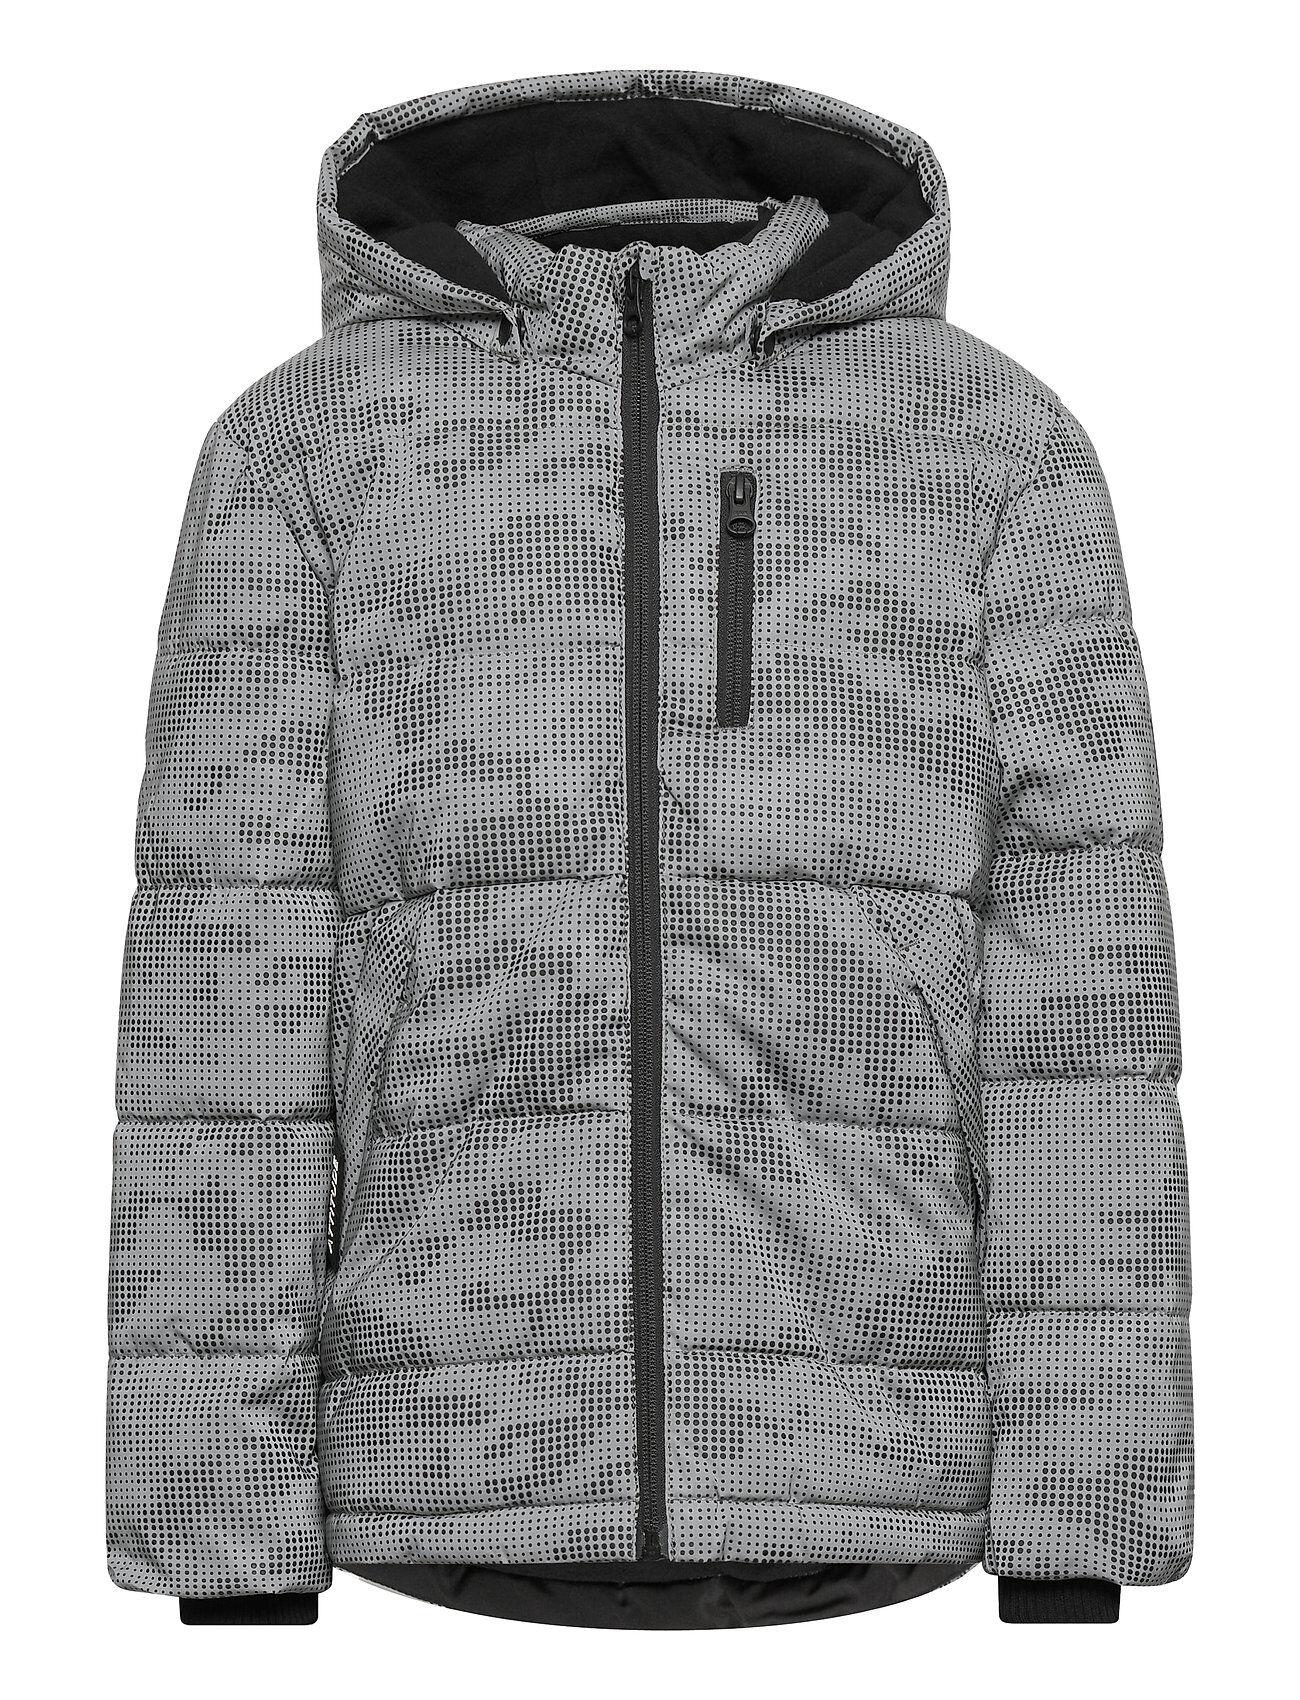 name it Nkmmonsson Reflective Jacket Toppatakki Harmaa Name It